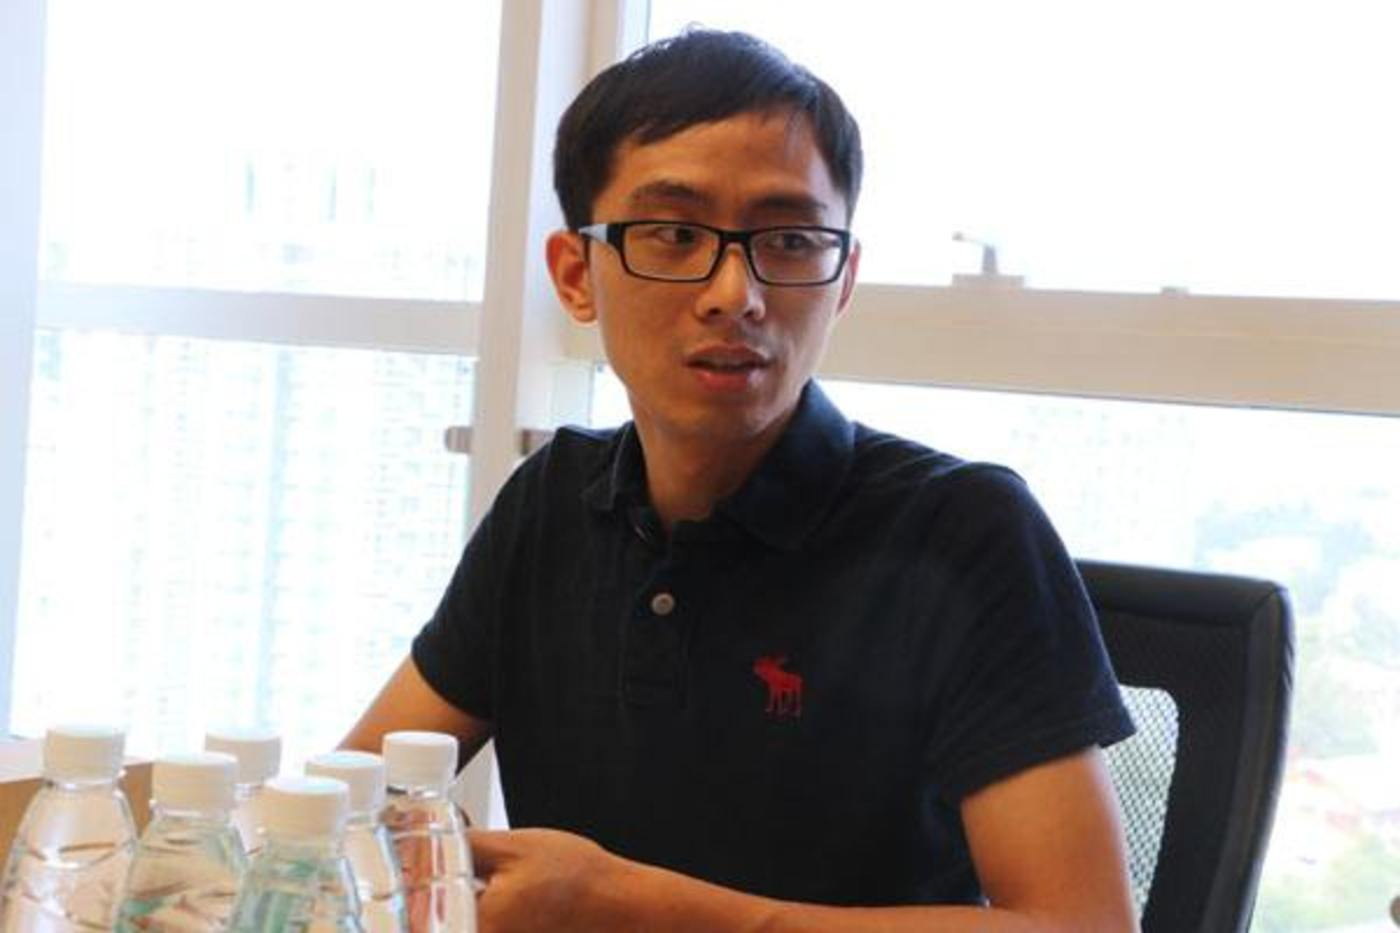 Gao Ziguang, Vice President of Xiaomi ecological chain & General Manager of Xiaomi Youpin